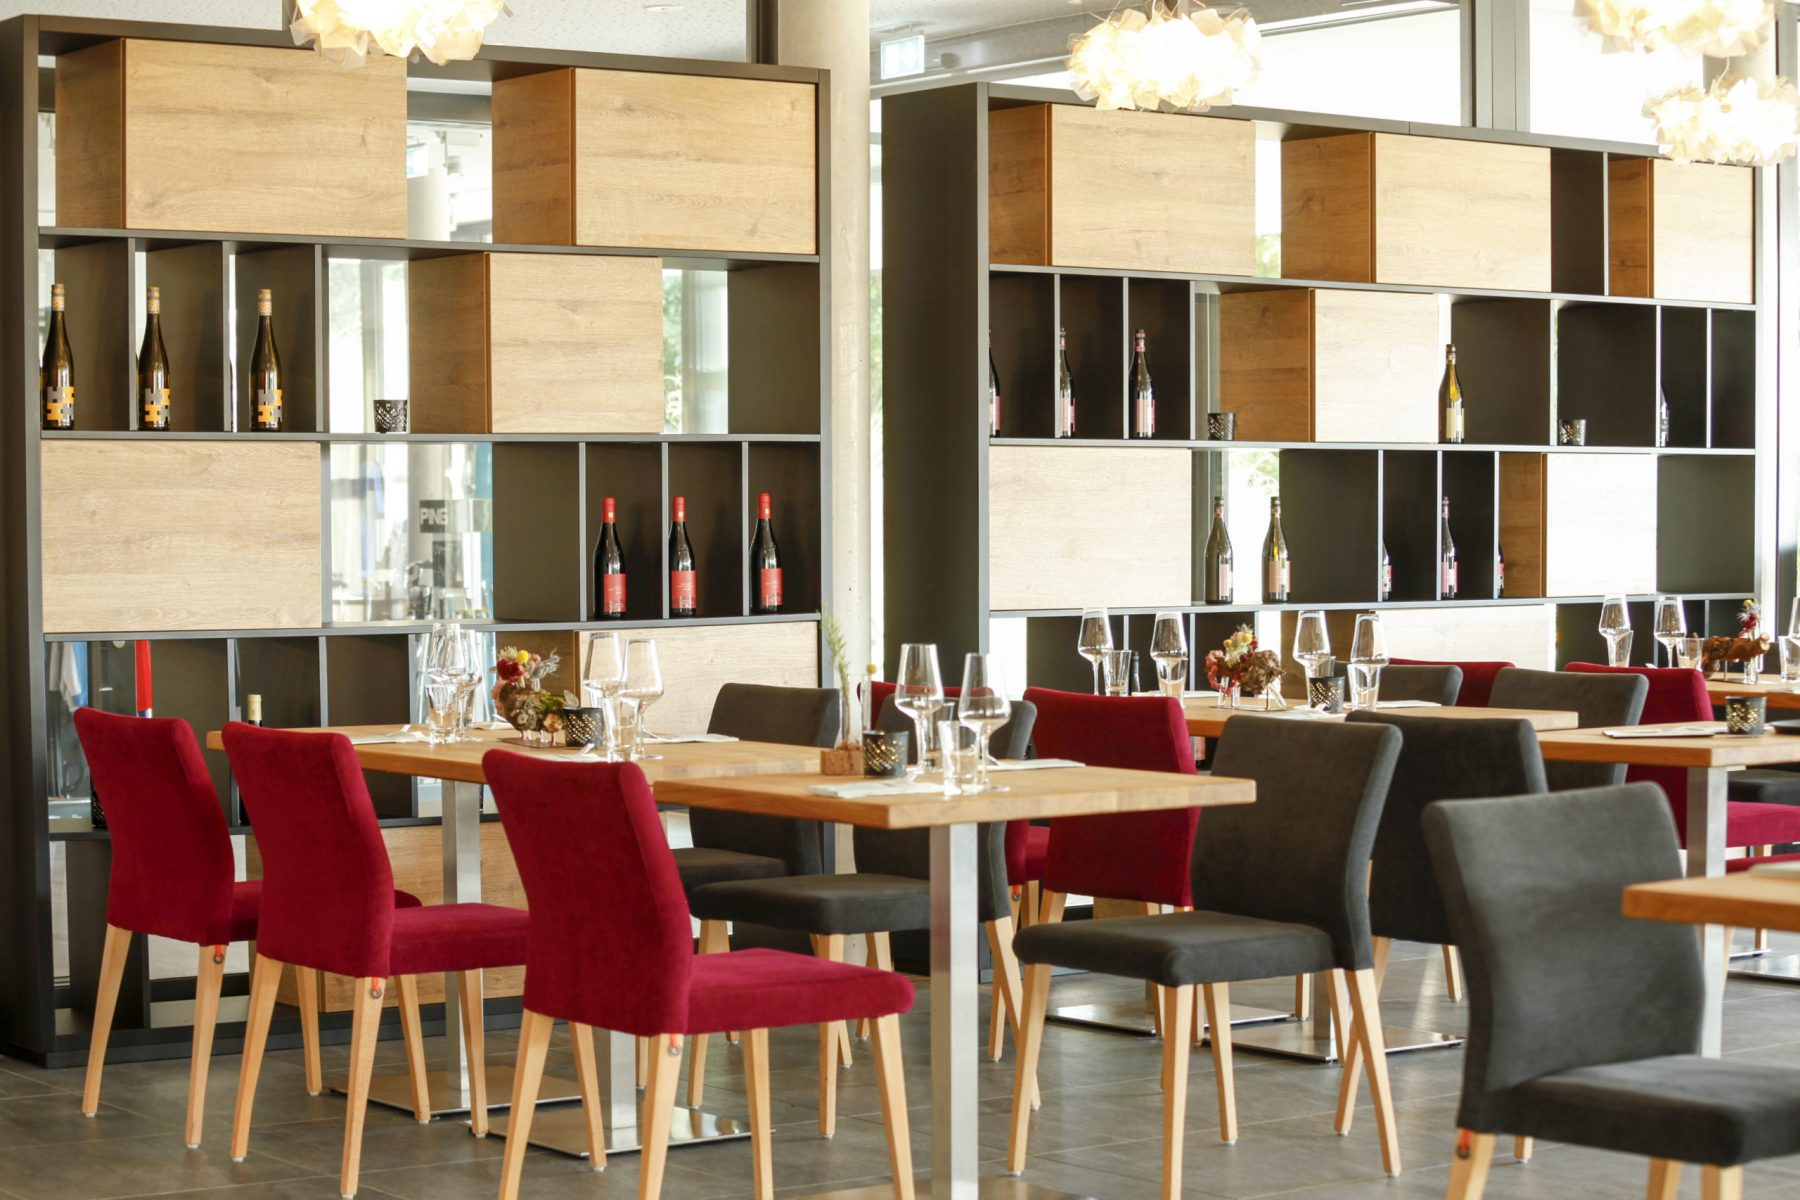 © Heitlinger Gastro & Hotel Betriebs GmbH